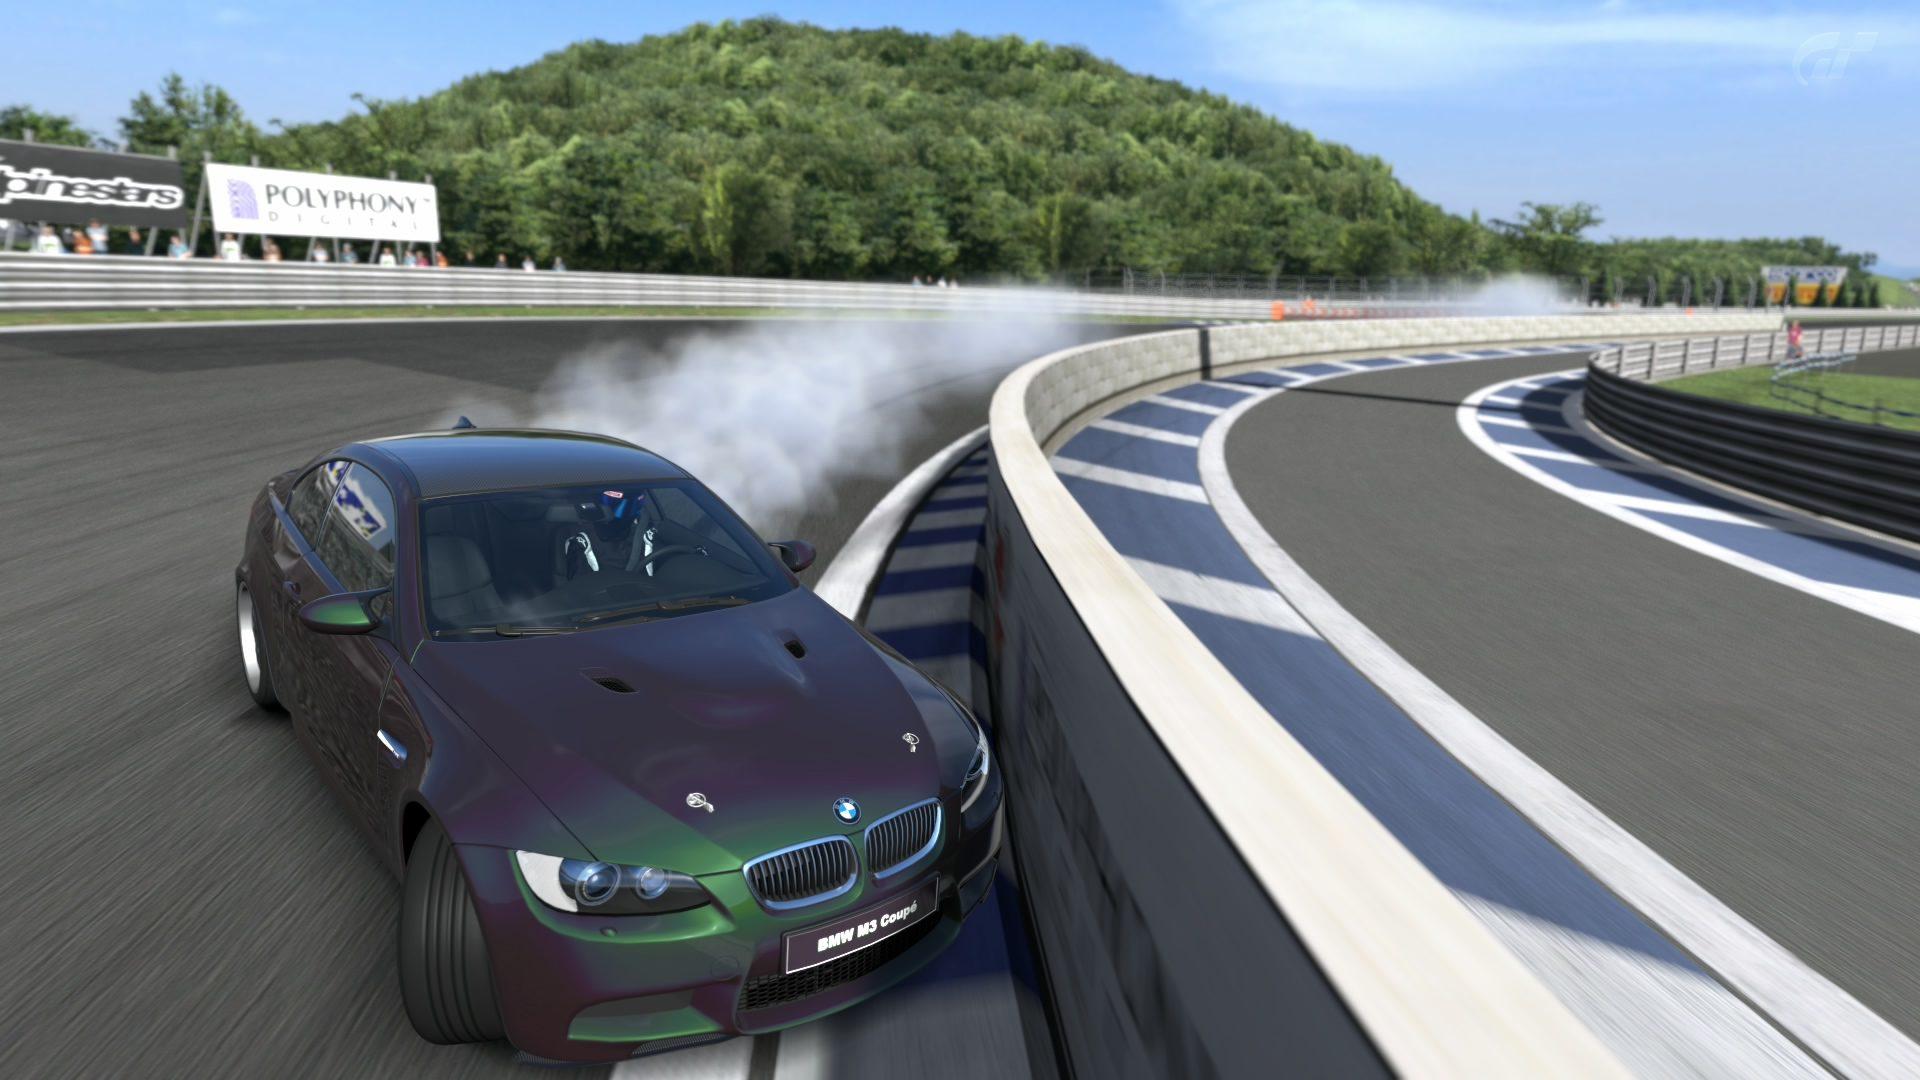 BMWCape Ring North_3.jpg